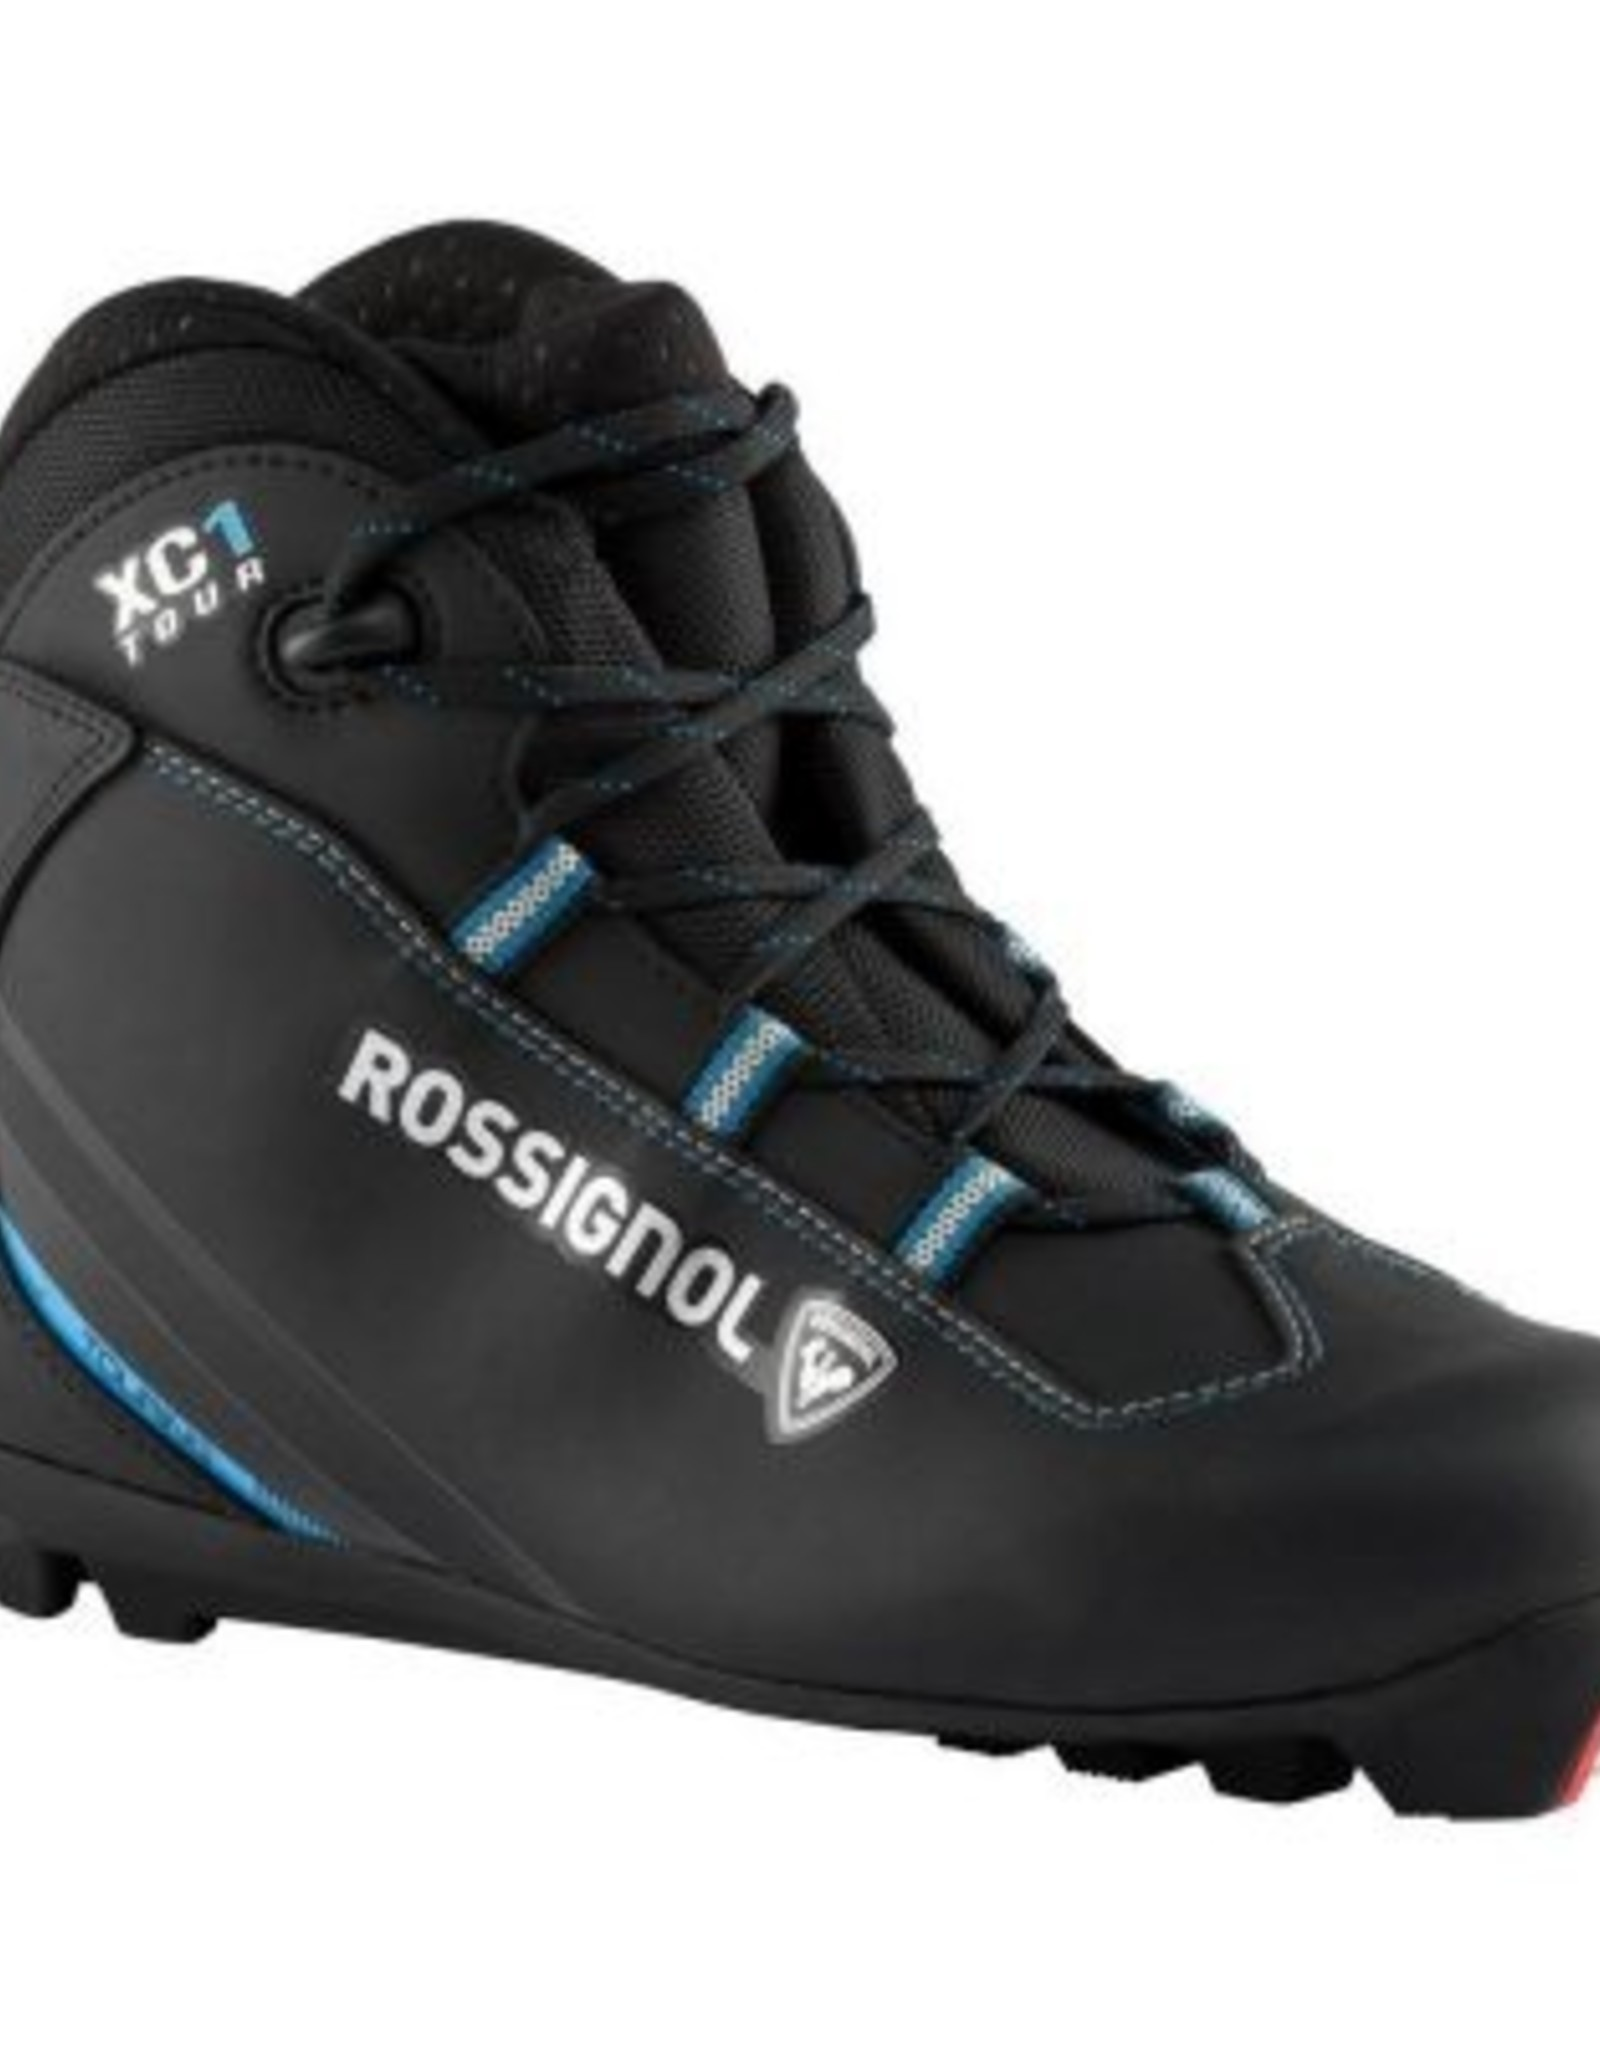 Rossignol Bottes Ski de Fond Rossignol XC-1 FW